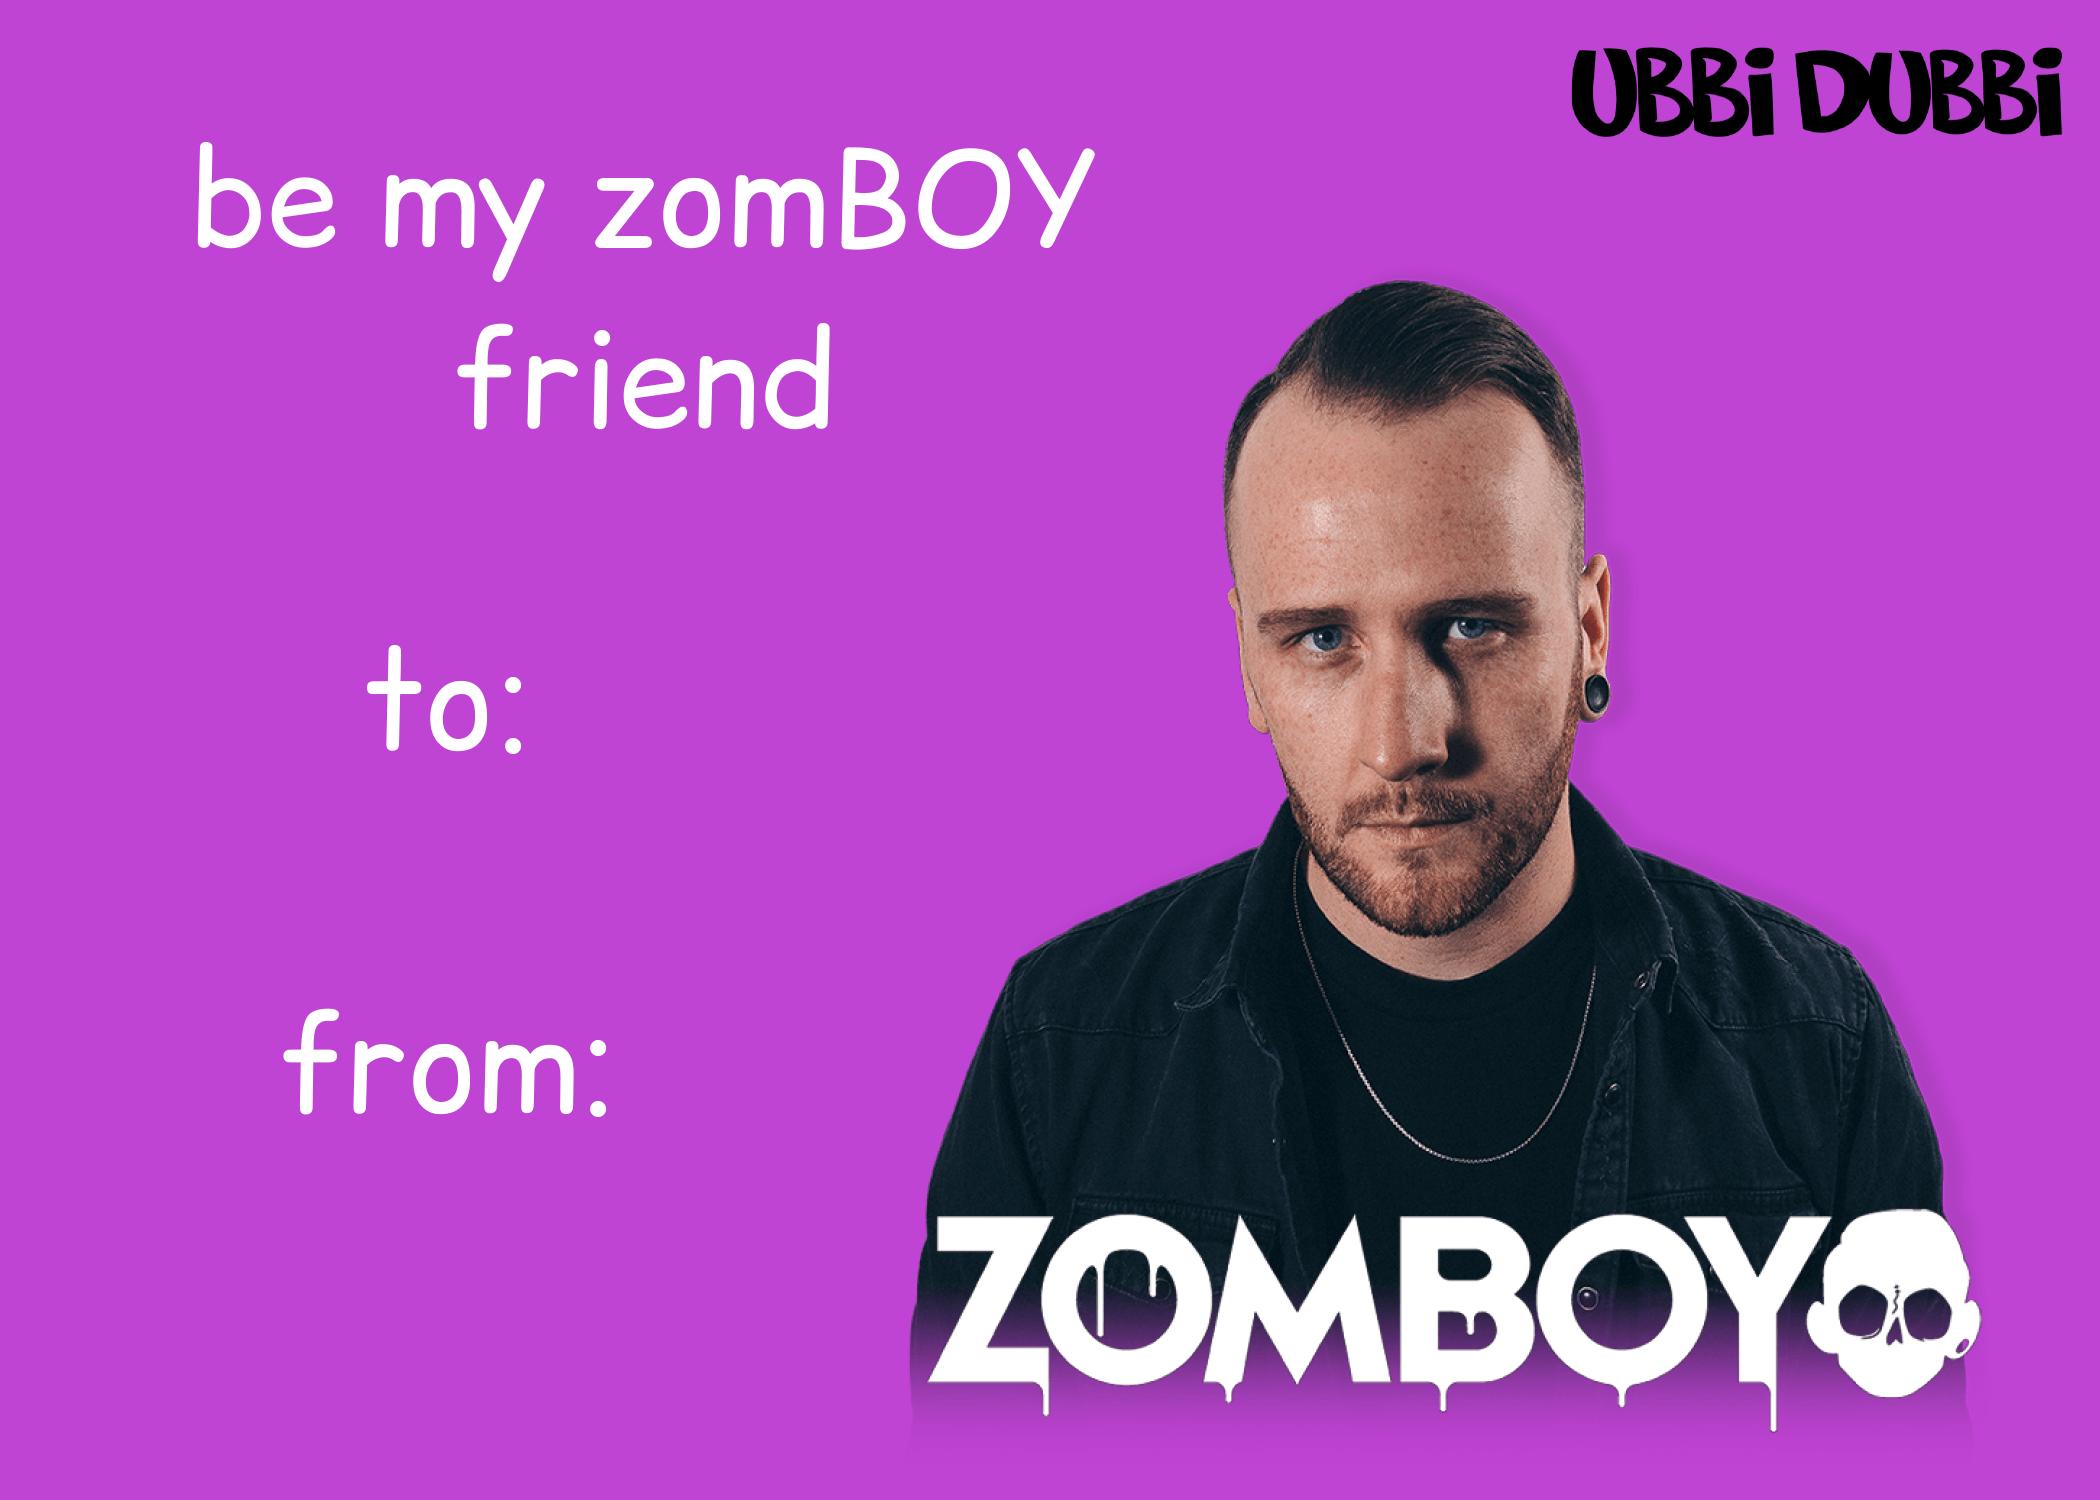 ubbi dubbi valentine's day card for zomboy